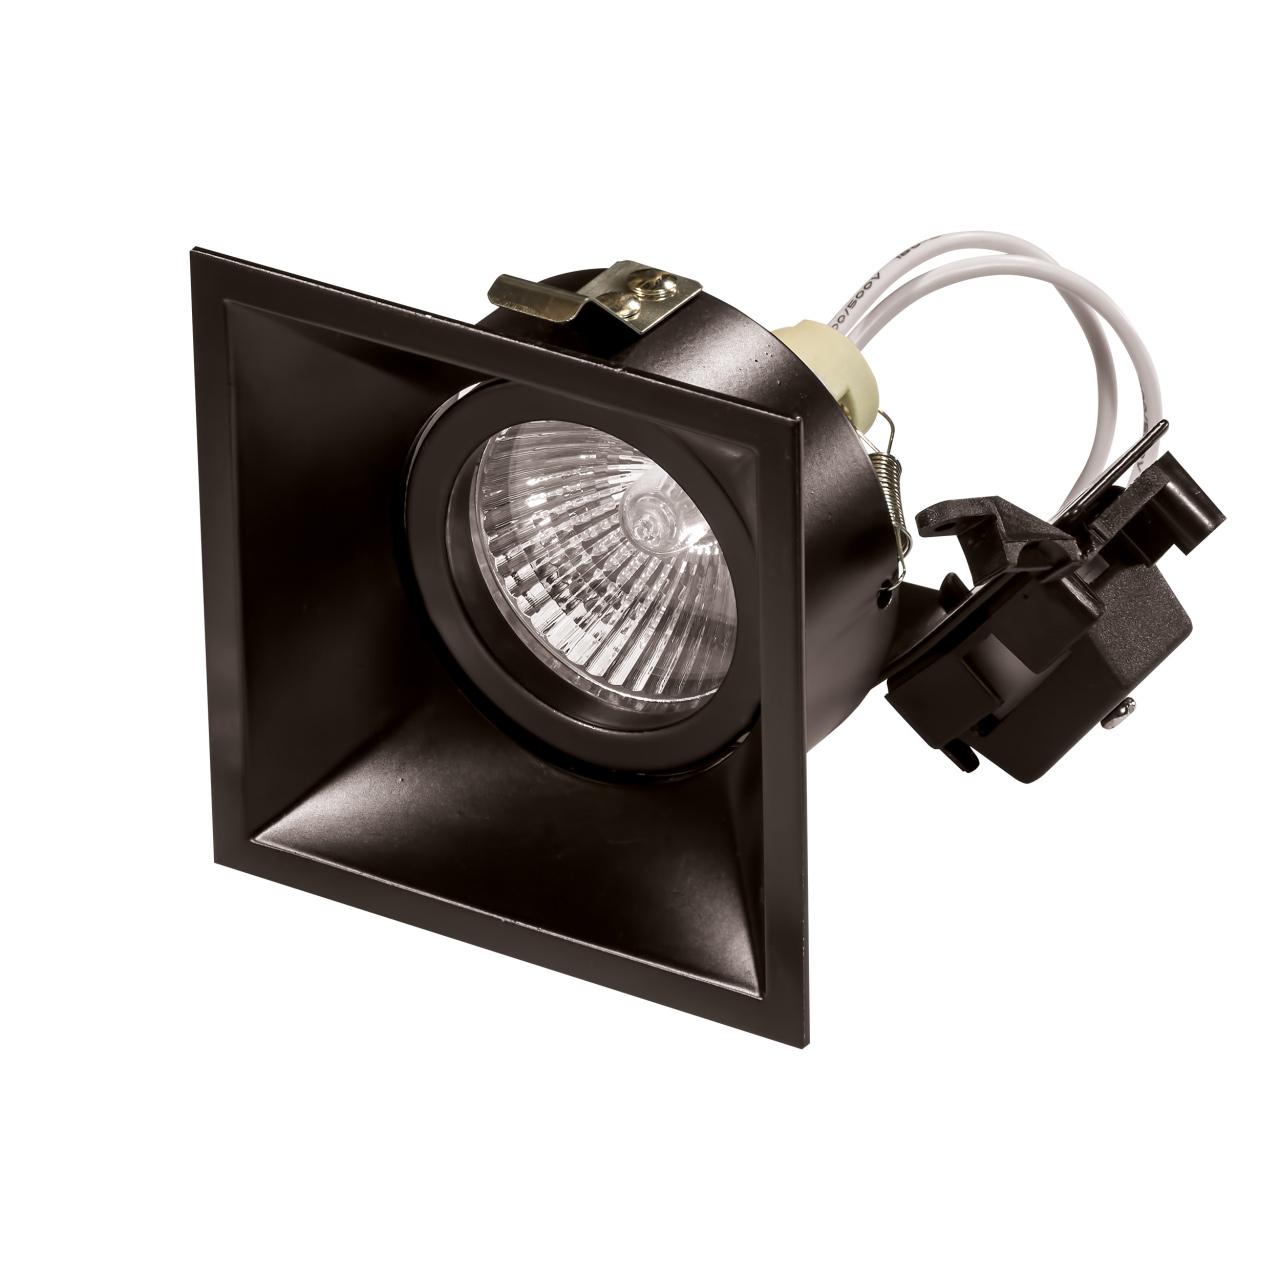 Светильник Domino quadro MR16 черный Lightstar 214507